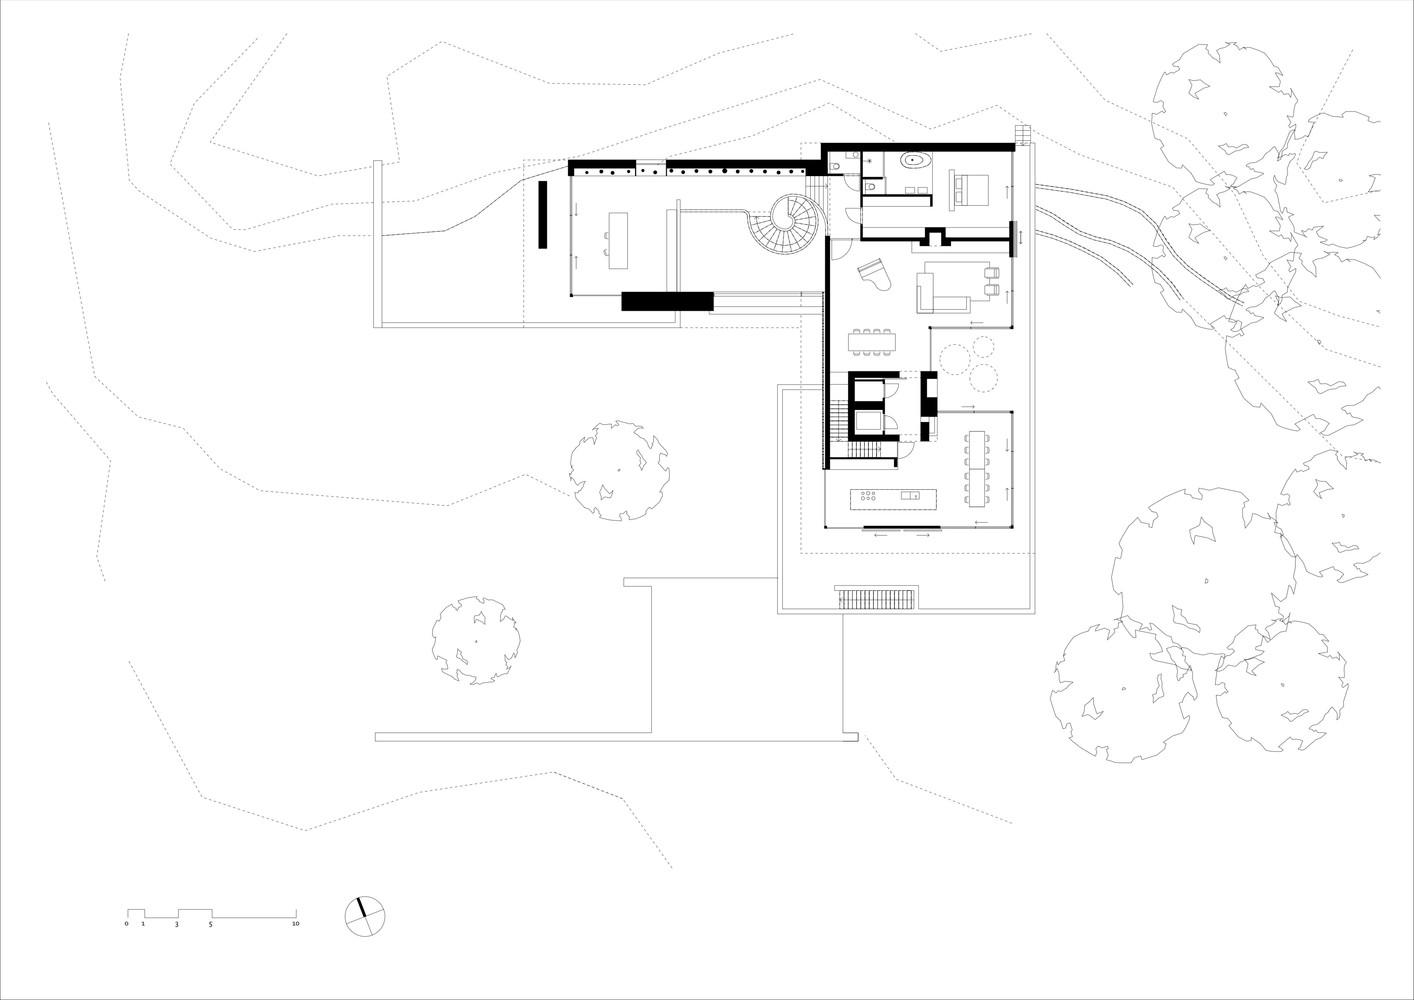 Dune villafirst floor plan